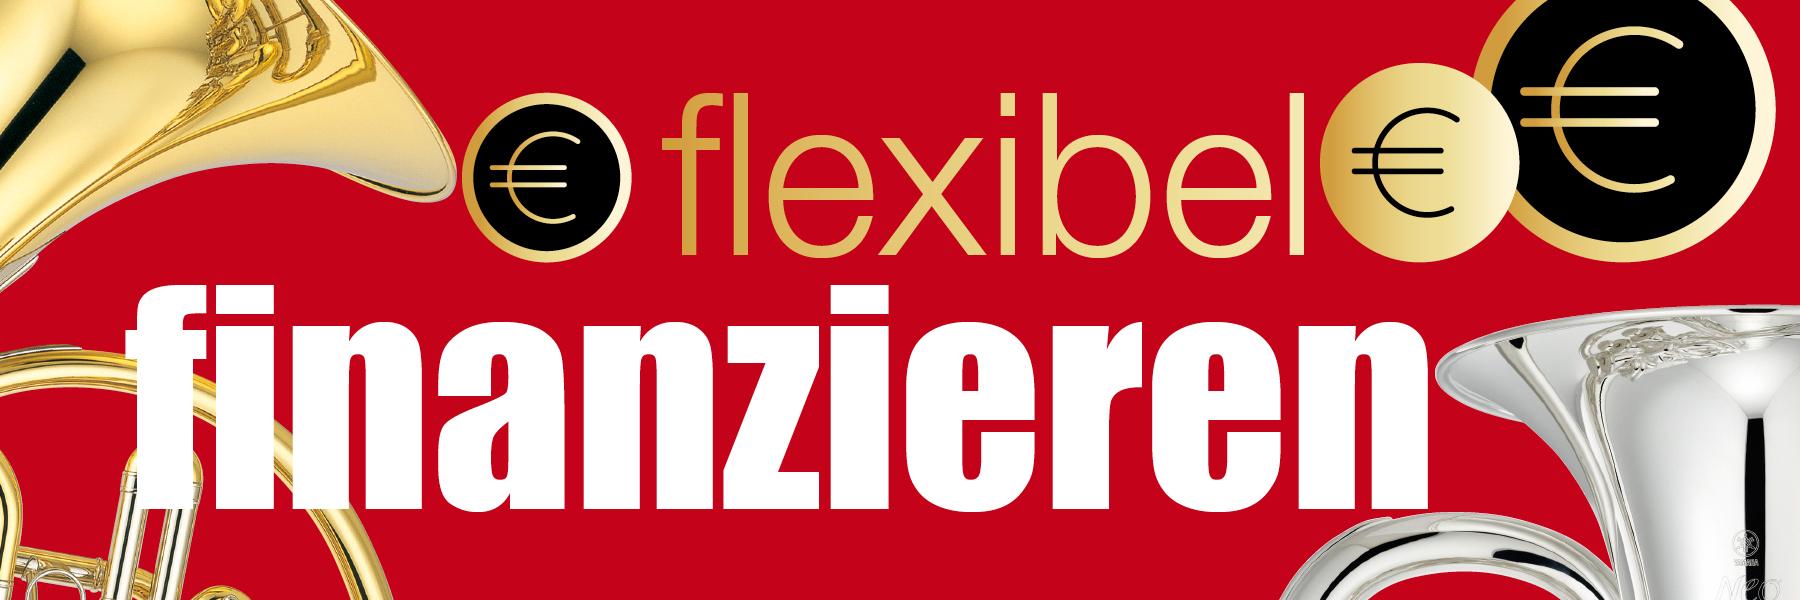 FlexibelFinanz_900x300